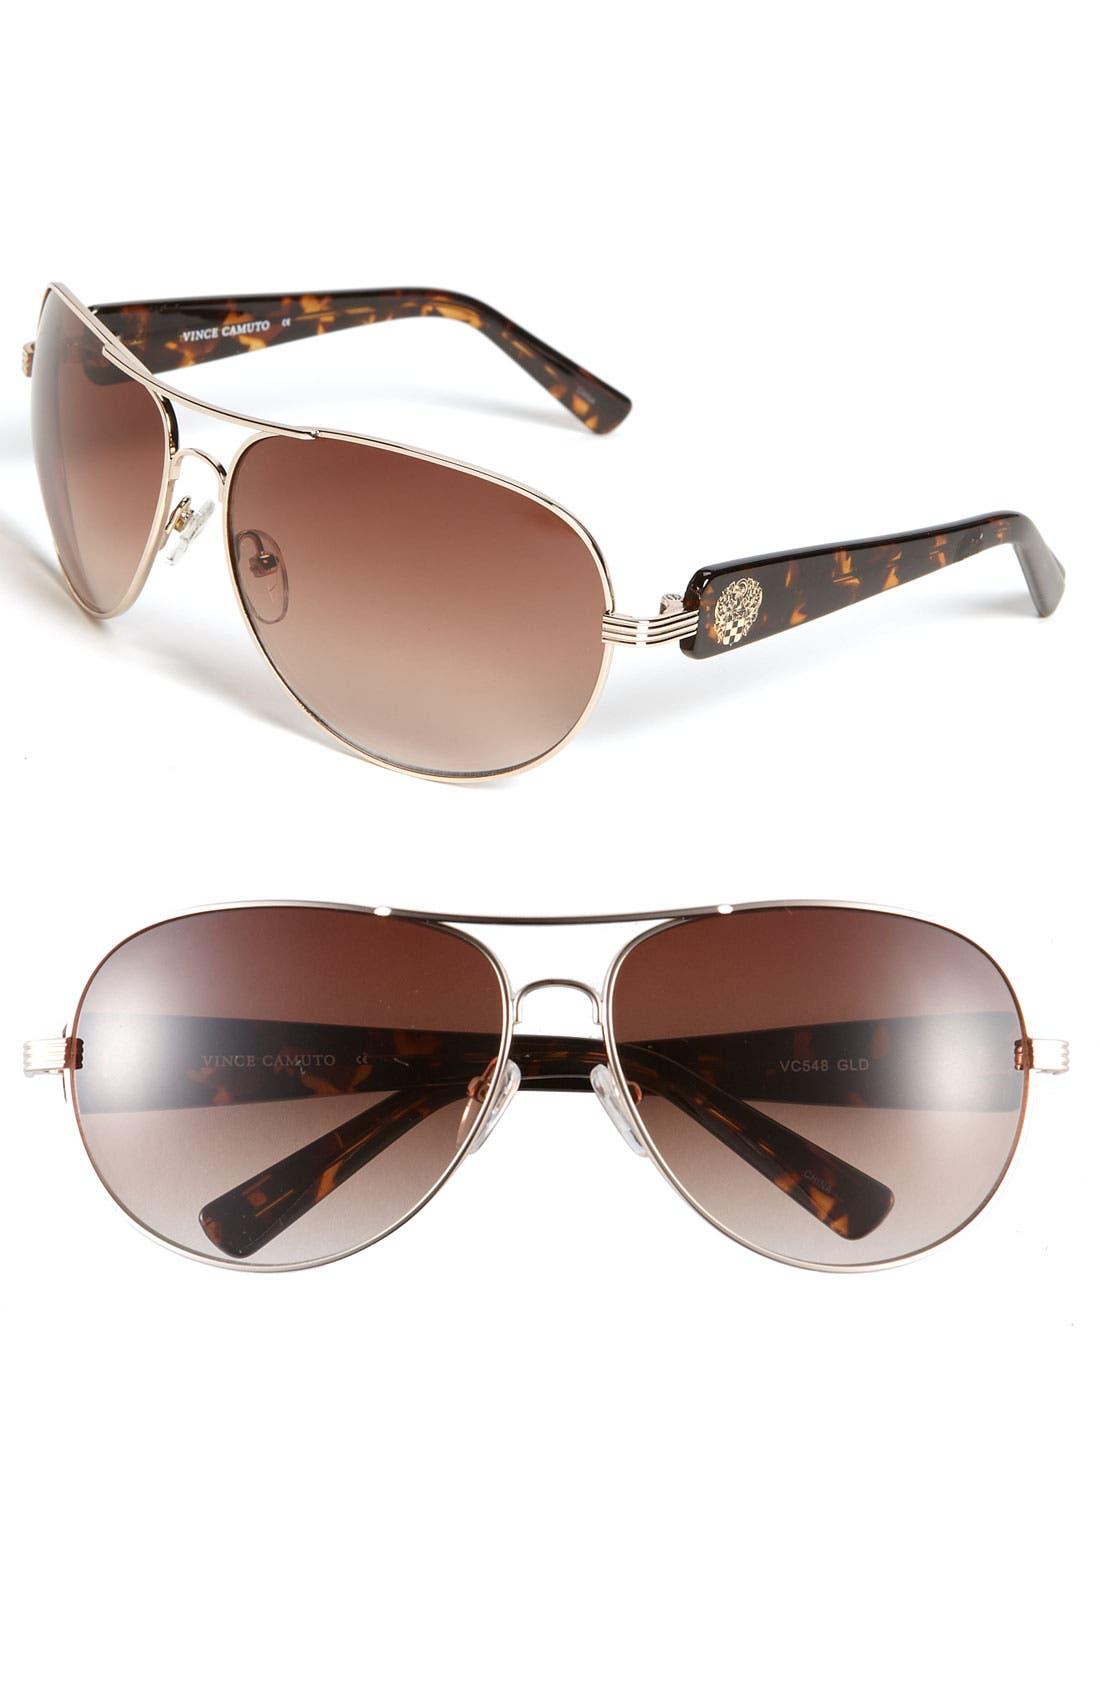 Alternate Image 1 Selected - Vince Camuto Metal Aviator Sunglasses